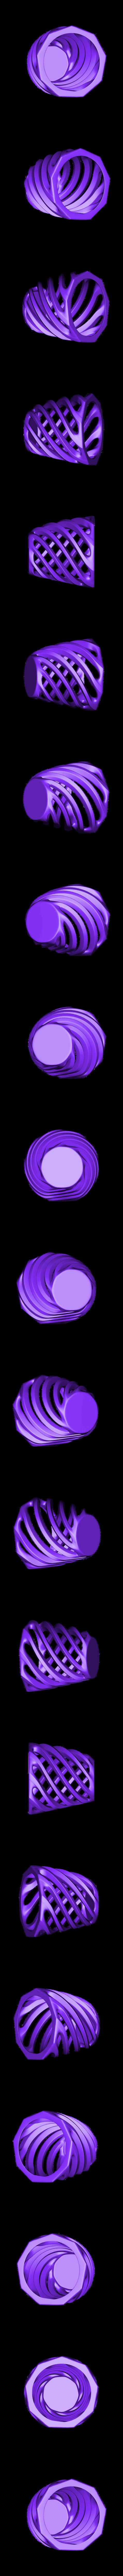 opentwistforwall.STL Download STL file wallmounted flowerpot • 3D printing model, Pratrik